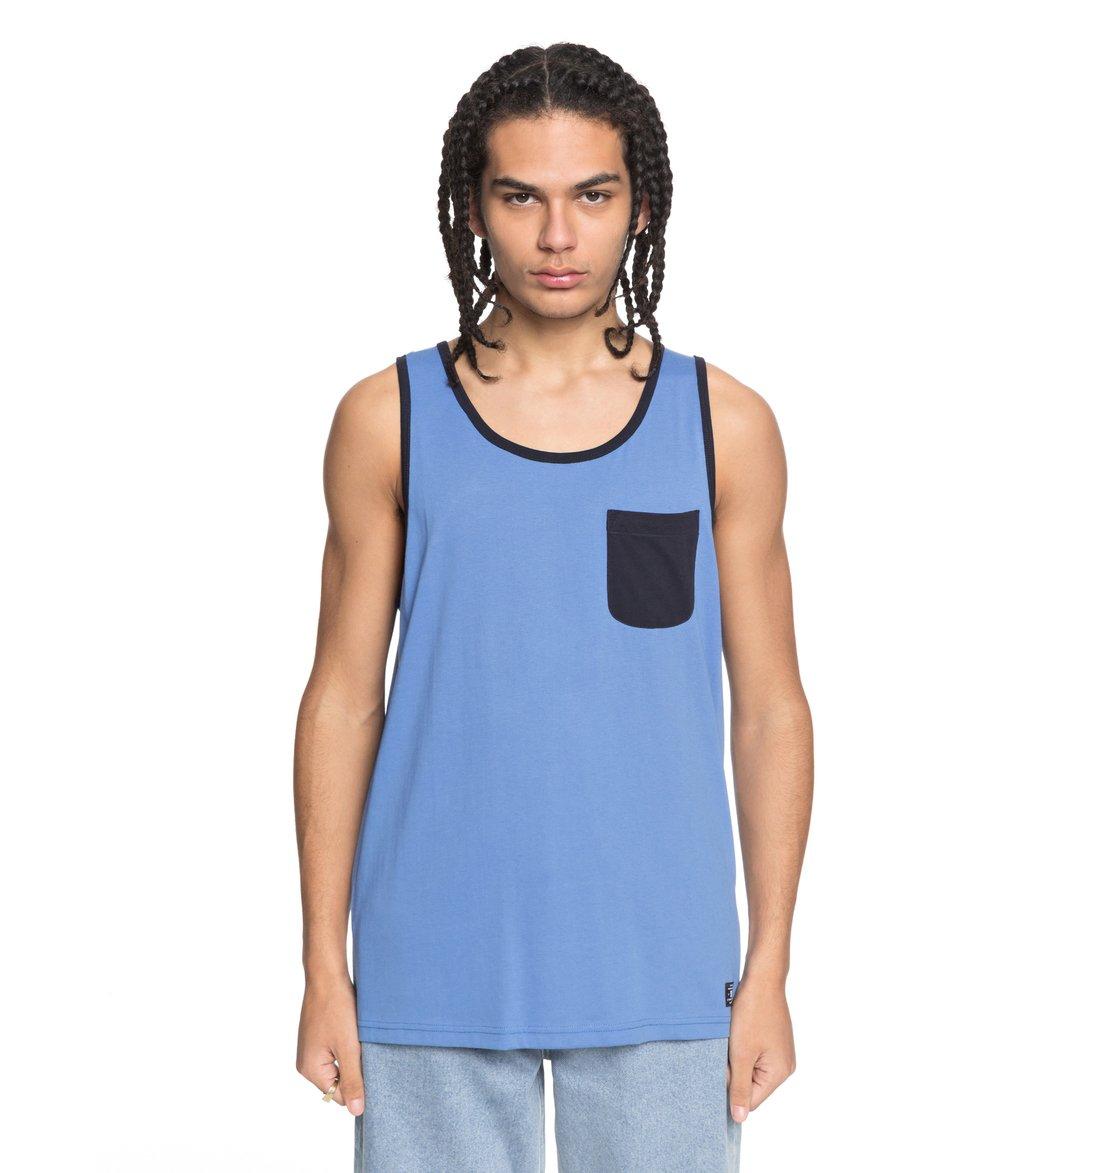 547fd60cf Contra 2 - Camiseta sin Mangas para Hombre